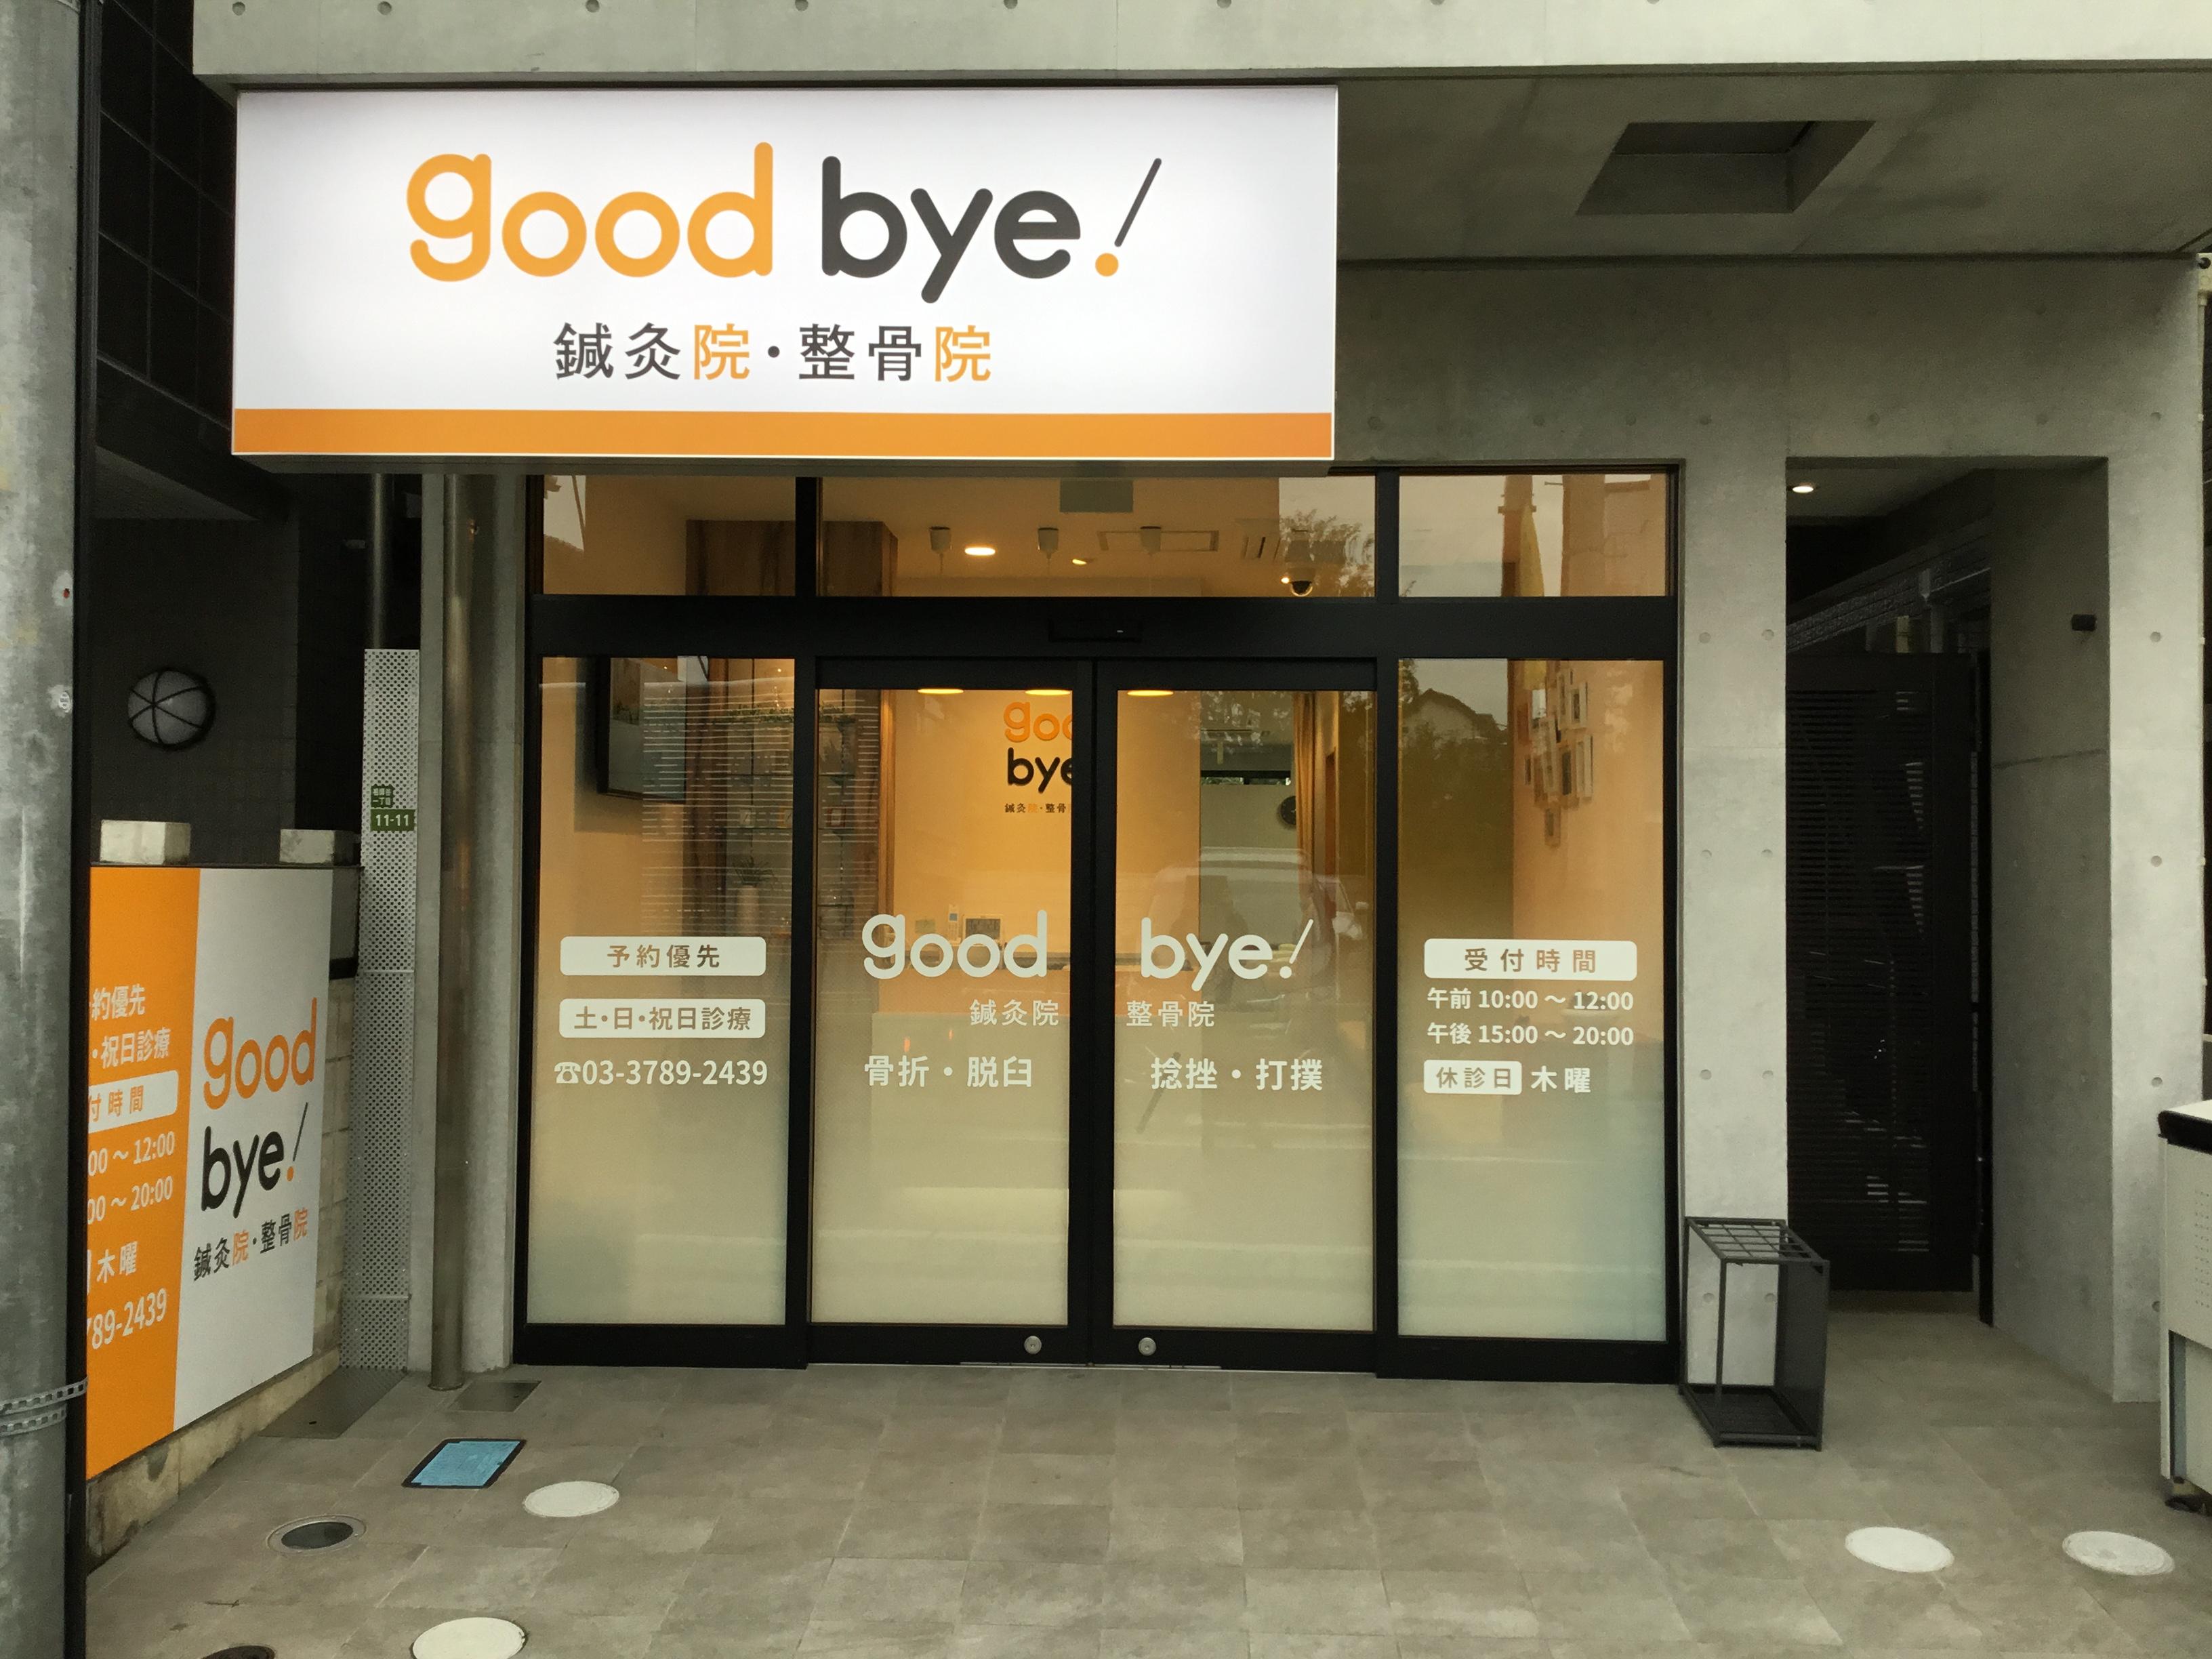 goodbye鍼灸院・整骨院・整体院